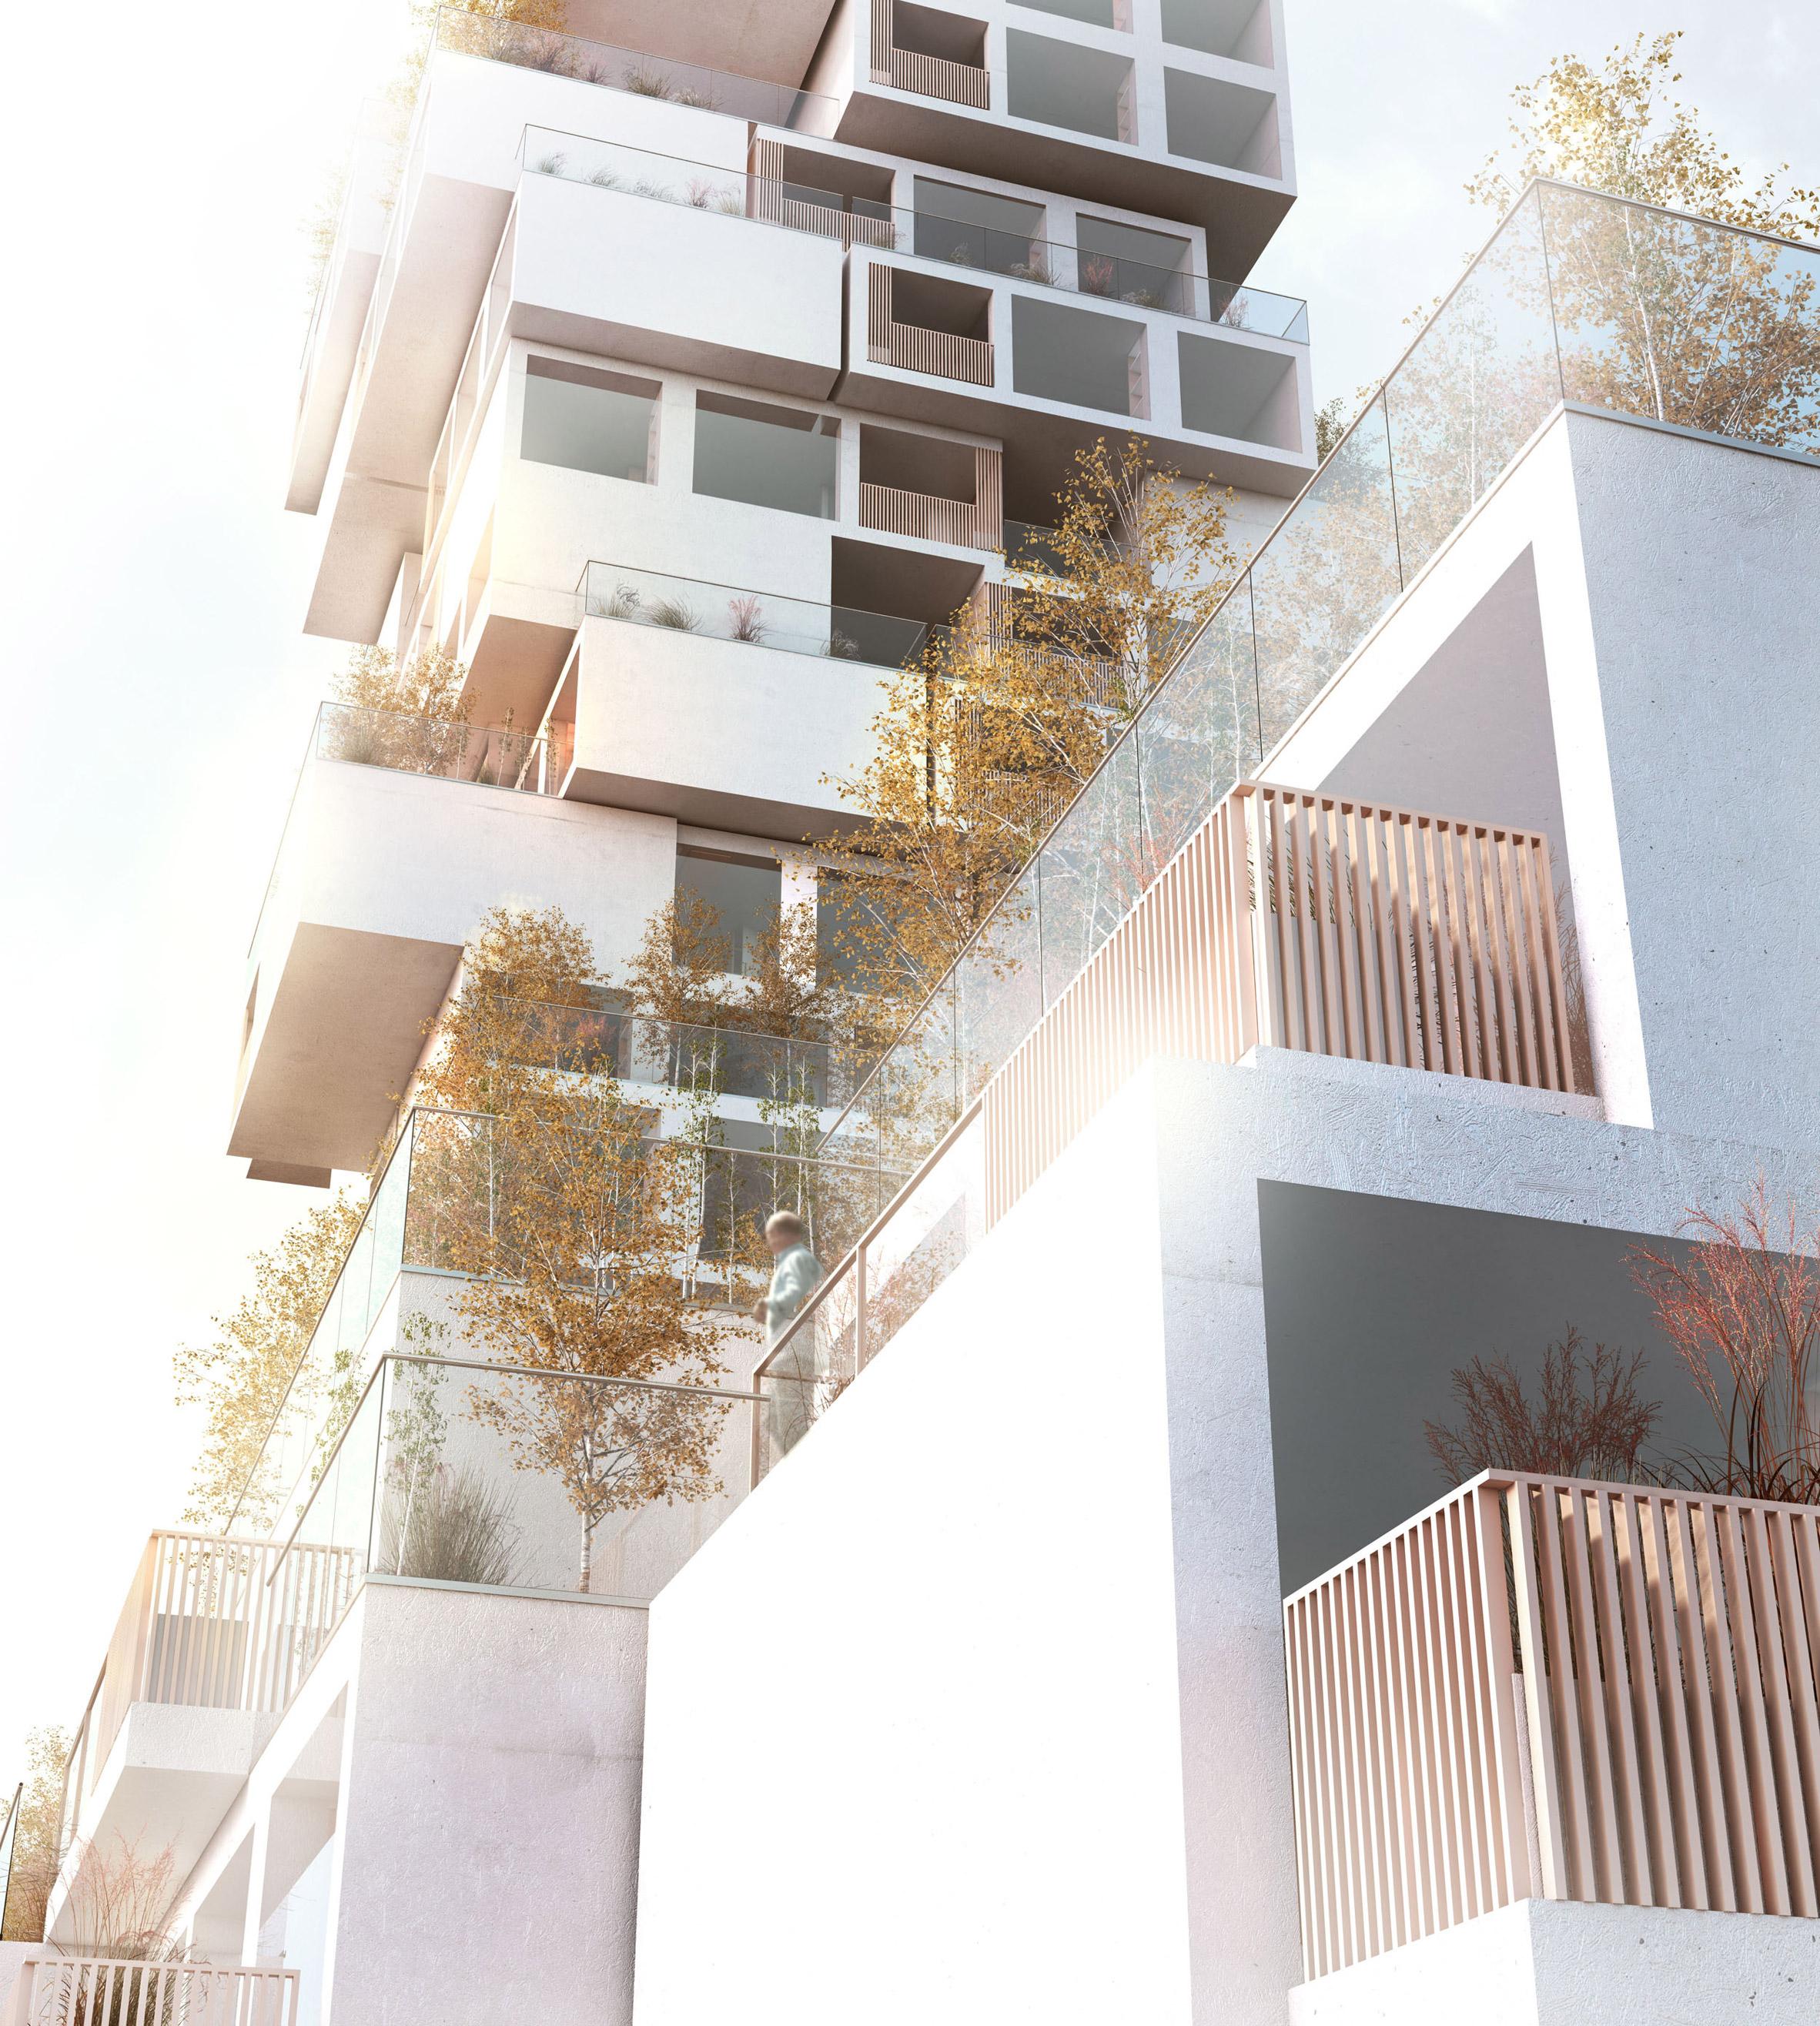 Weston Williamson proposes incremental building to combat Palestinian housing shortage